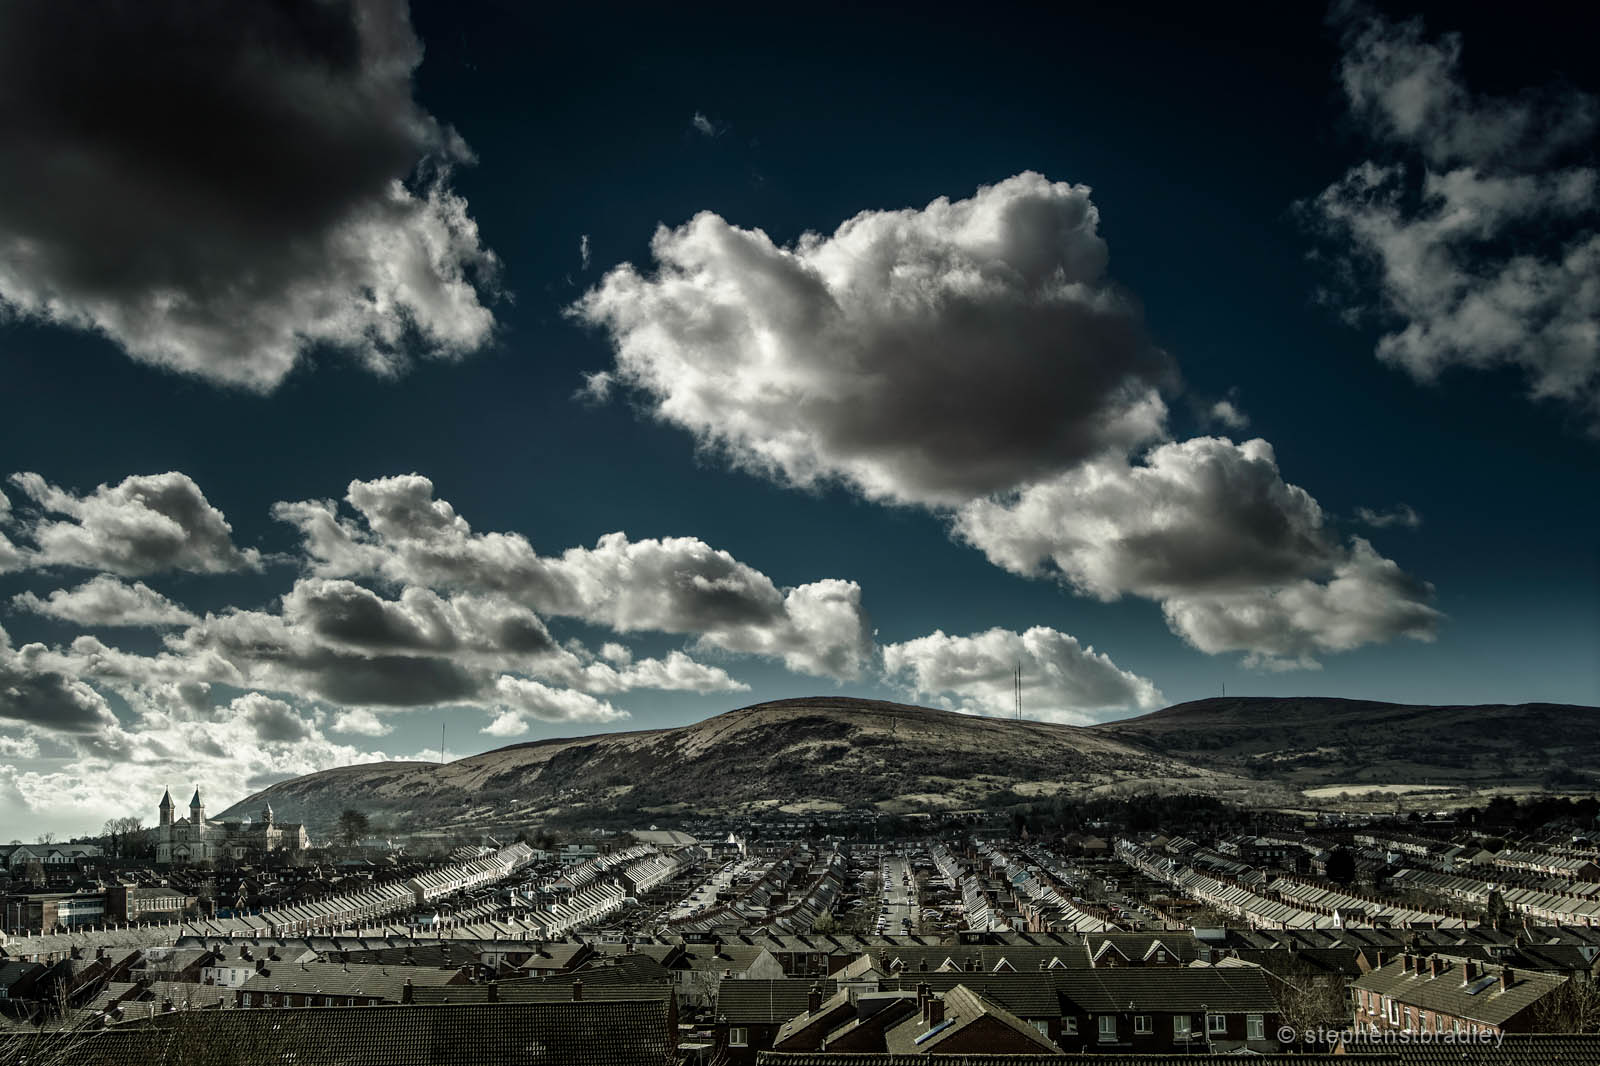 Ardoynescape - fine art landscape photograph 0945 by Stephen S T Bradley